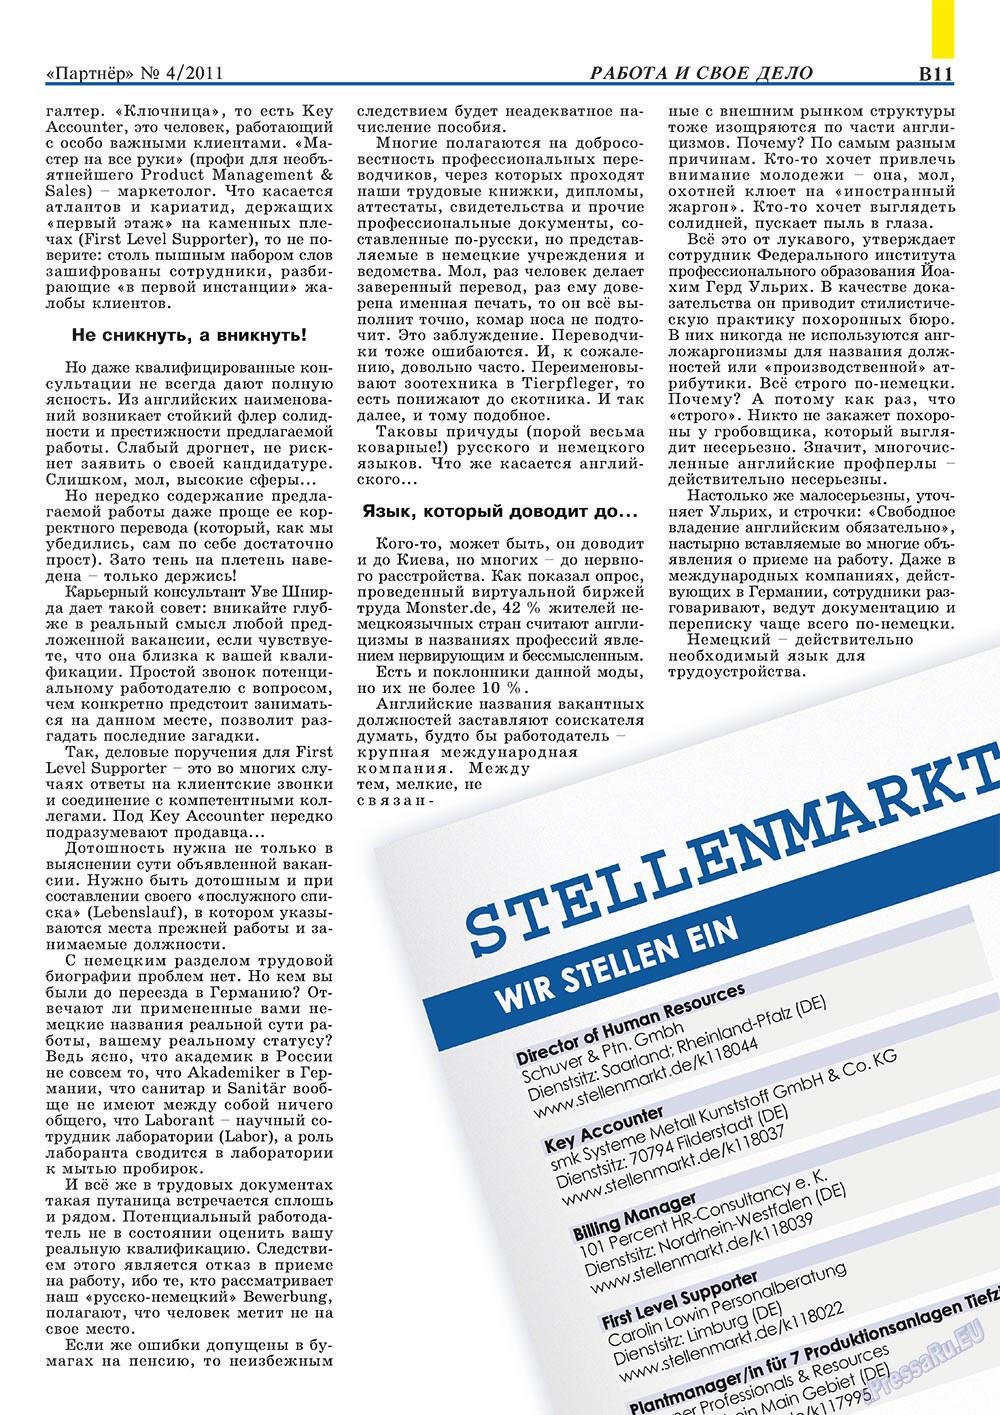 Партнер-север (журнал). 2011 год, номер 4, стр. 21